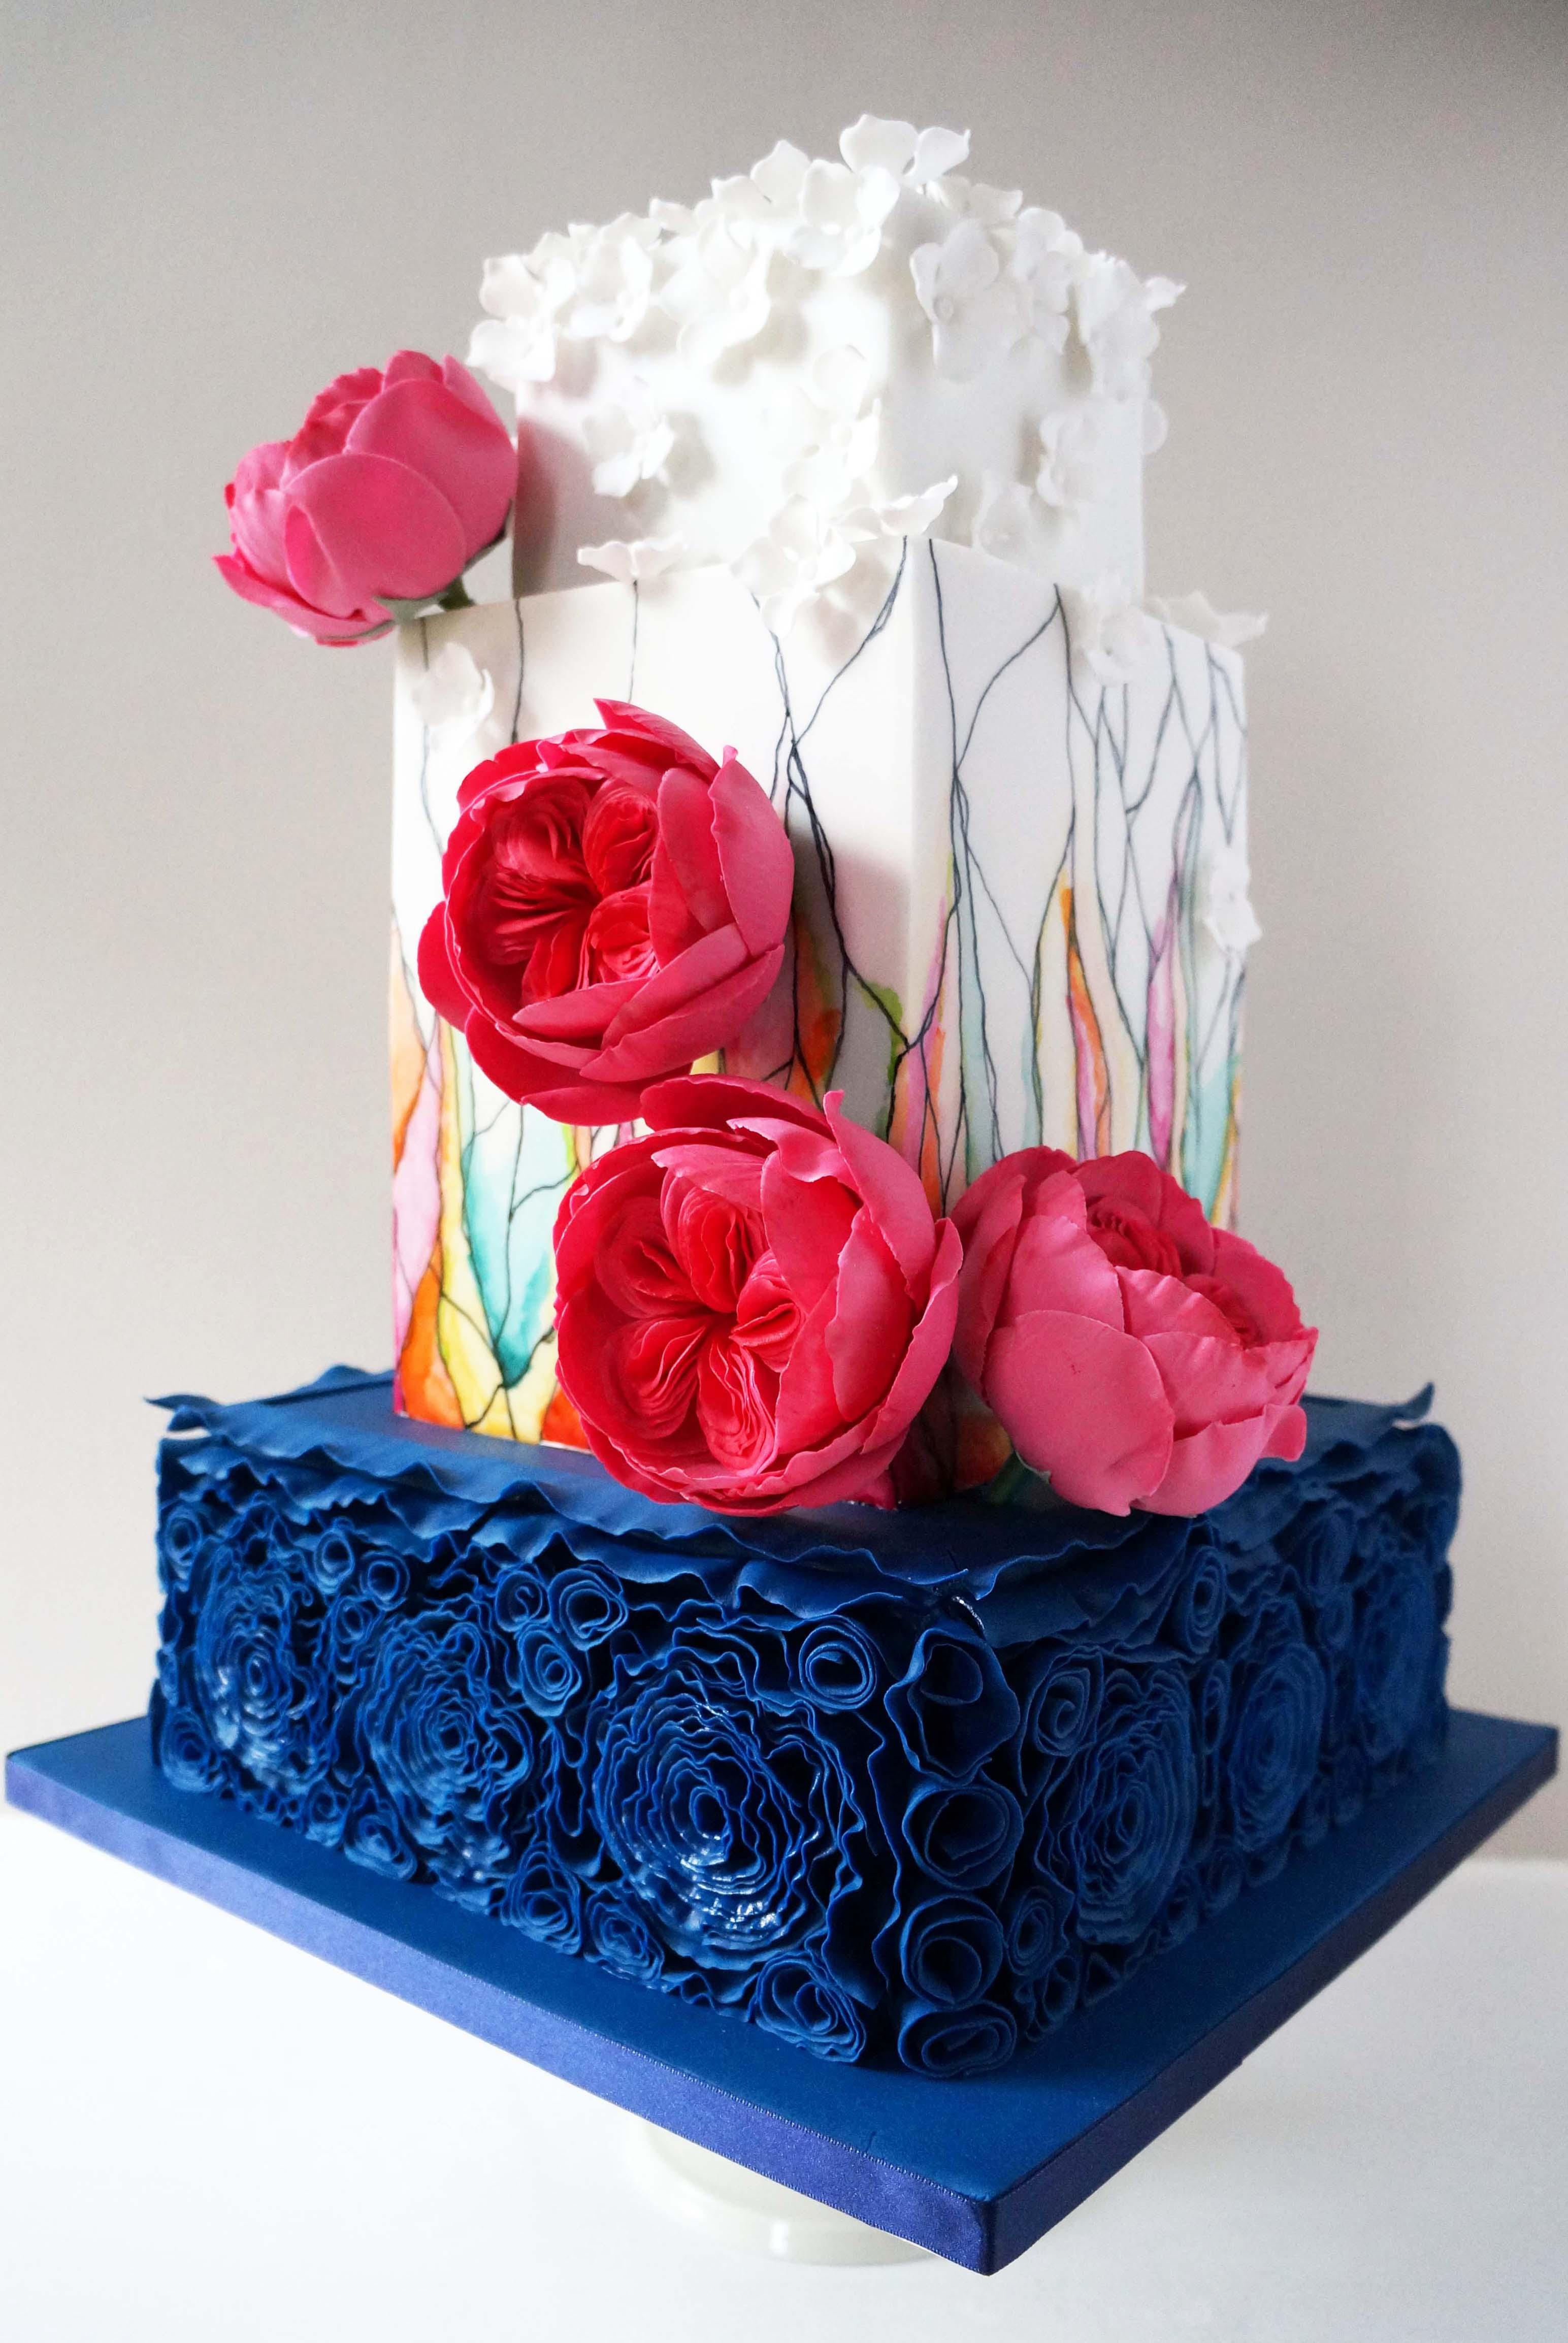 White with blue rosettes square wedding cake